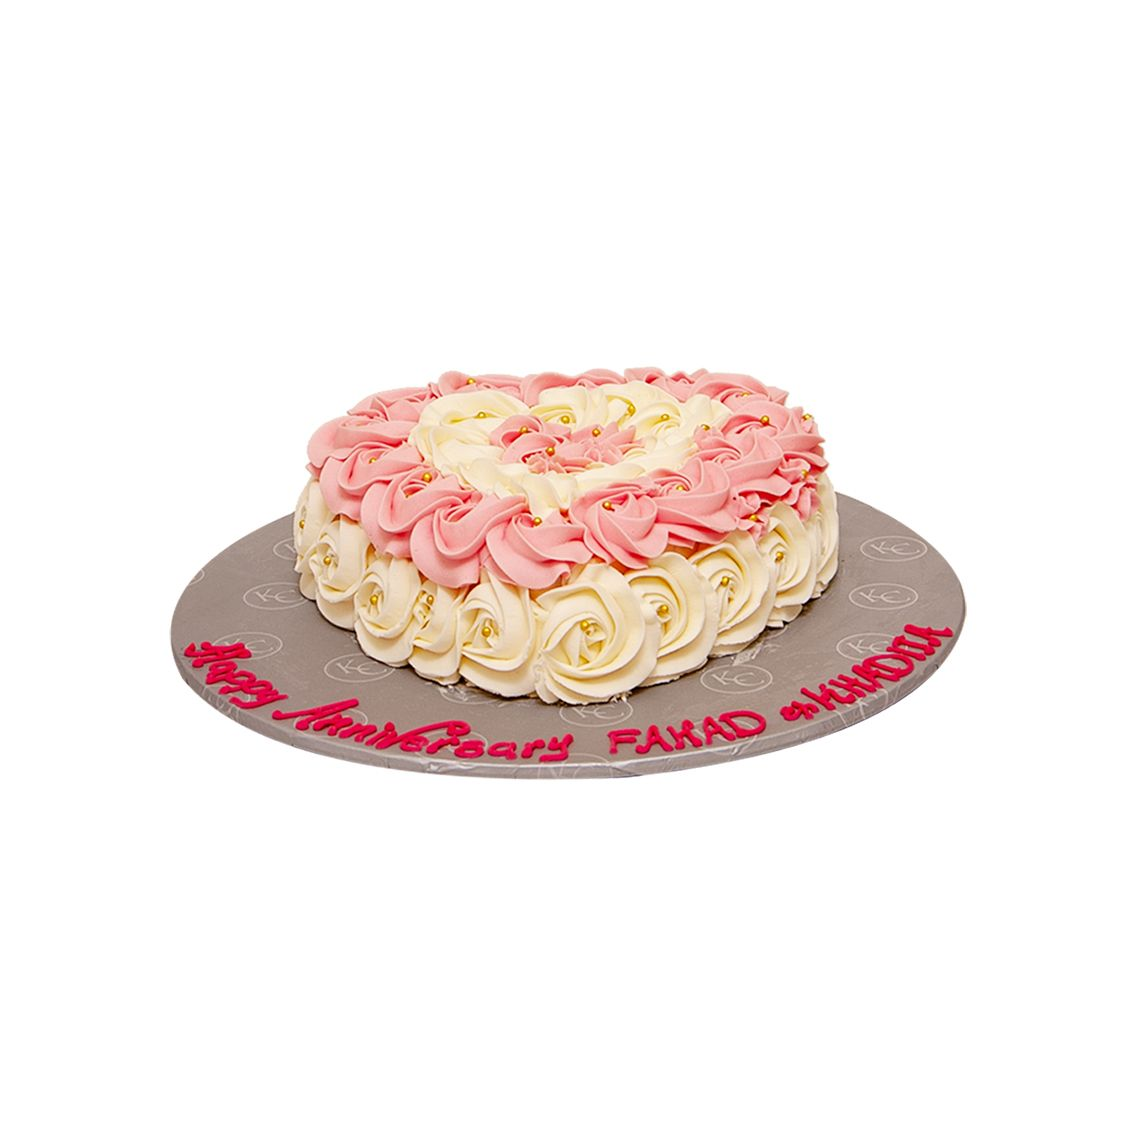 Kitchen Cuisine Default Category Pink & White Rosette Cake